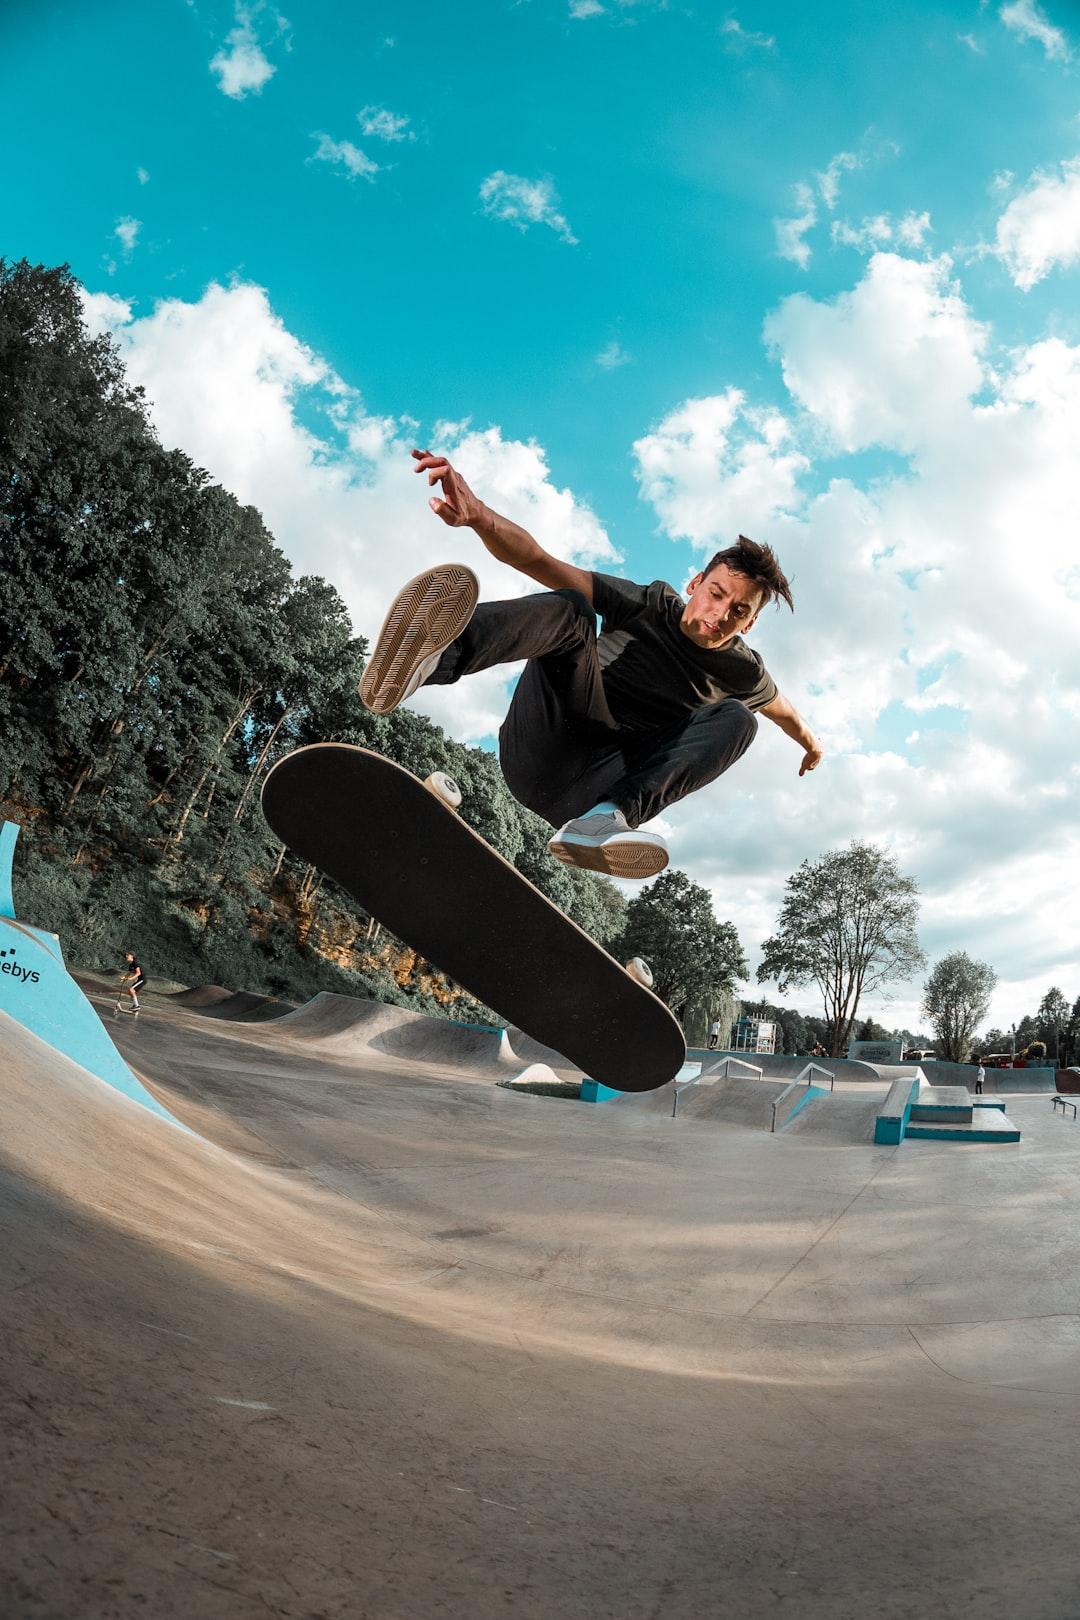 Skateboarder (Karel Hospodka) doing a kick flip